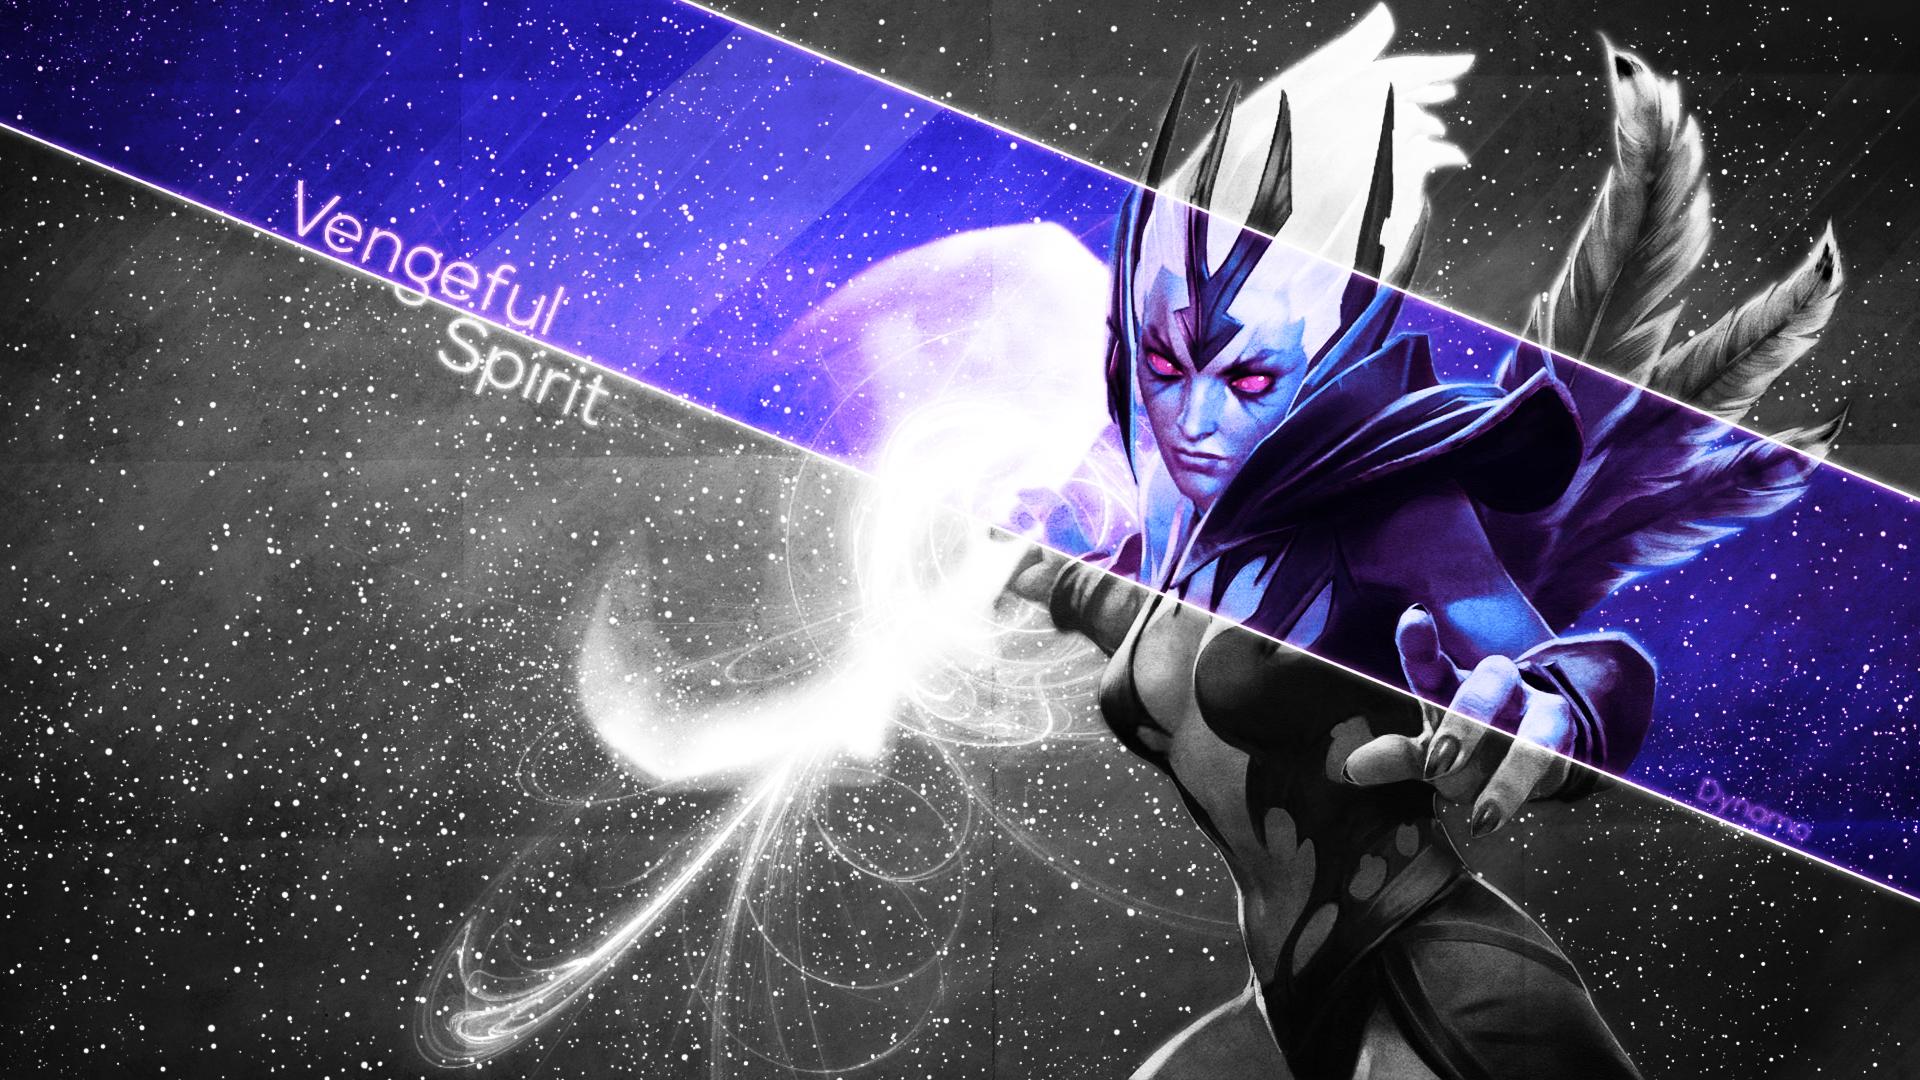 5753) Dota 2 Vengeful Spirit Iphone Wallpaper - WalOps.com